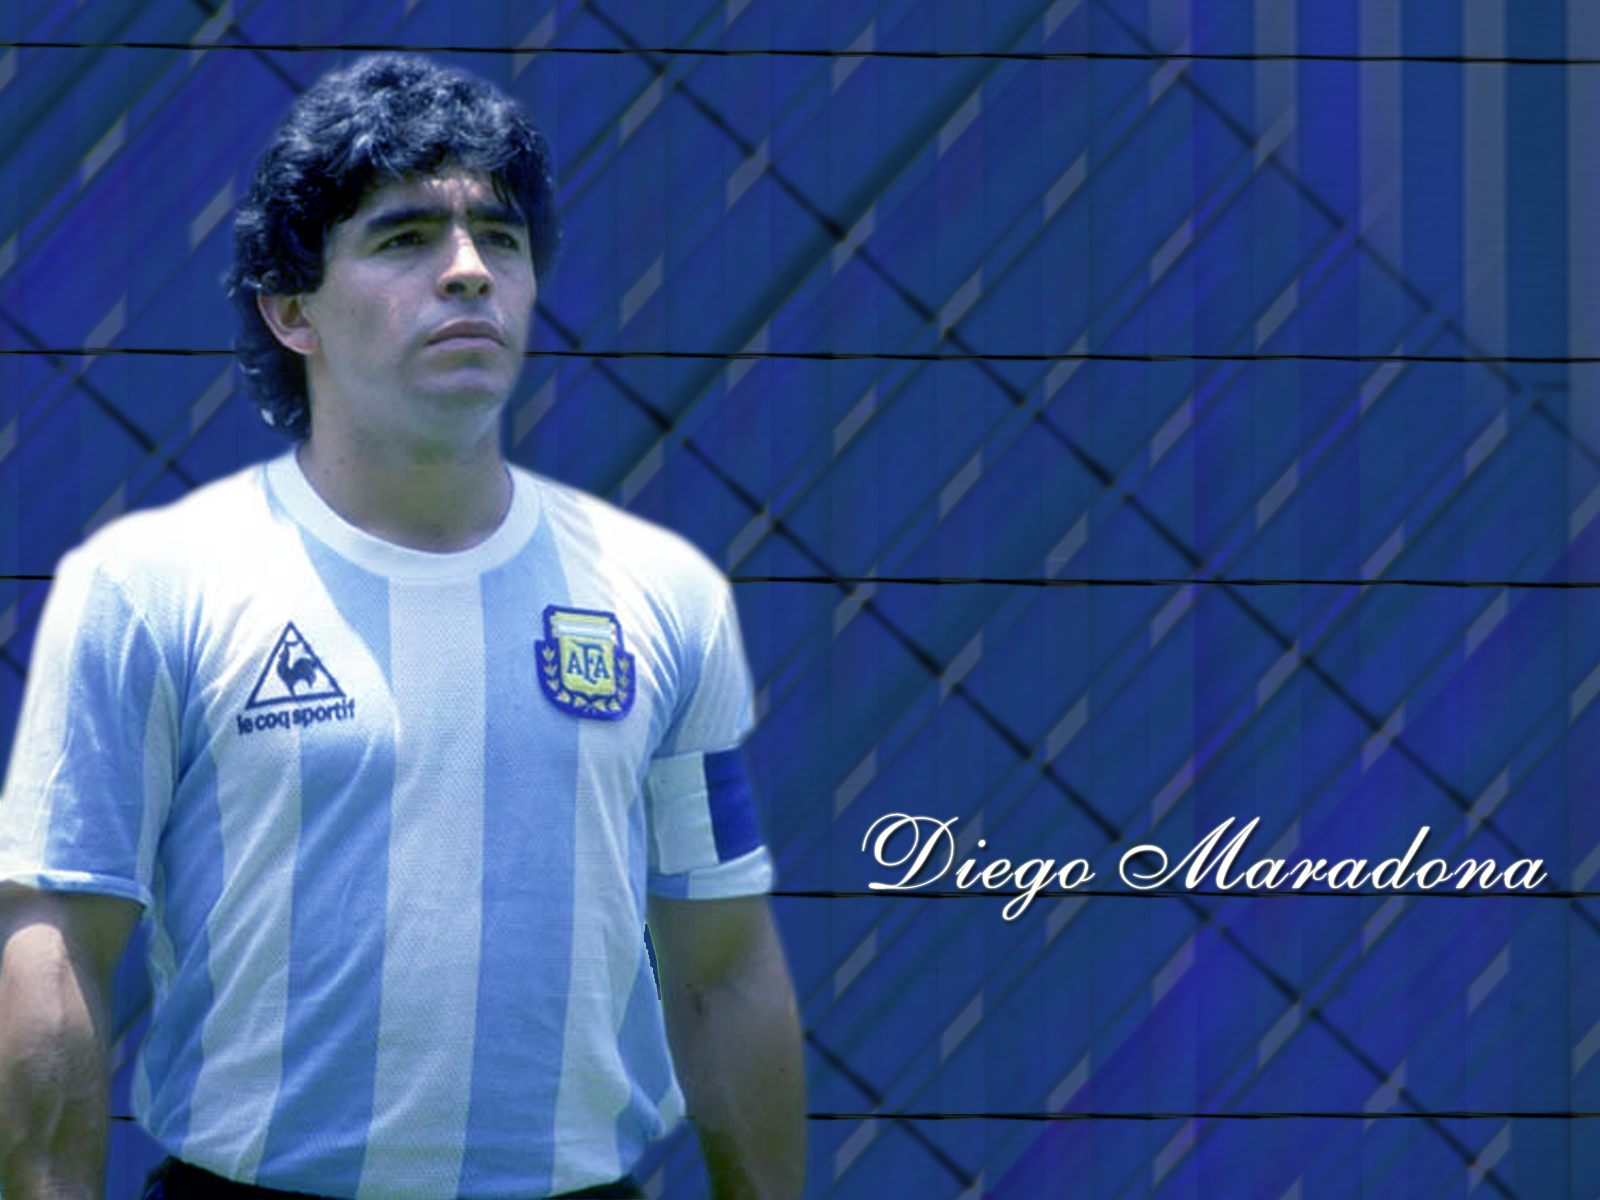 http://2.bp.blogspot.com/-v42VcDvt0cQ/Tu3yJgg-4yI/AAAAAAAAIaw/ZWGhdeUkxpU/s1600/Diego-Maradona-Wallpaper1.jpg